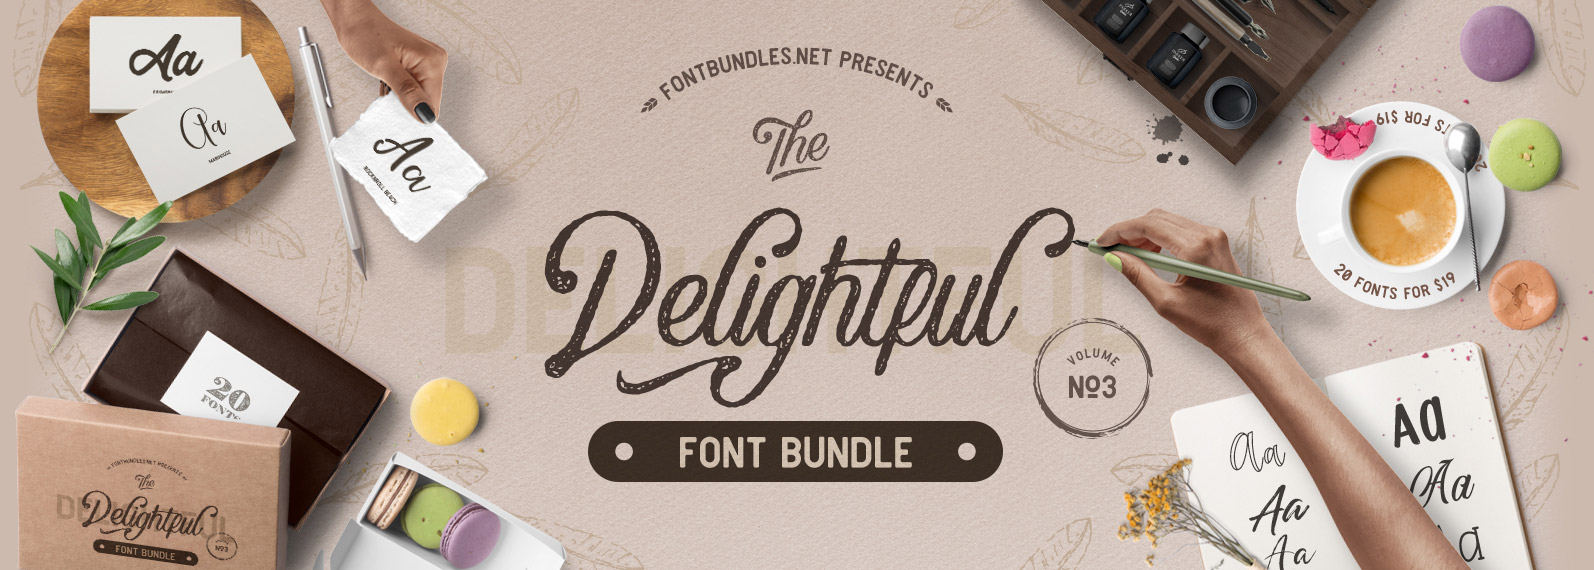 The Delightful Font Bundle Vol III Cover